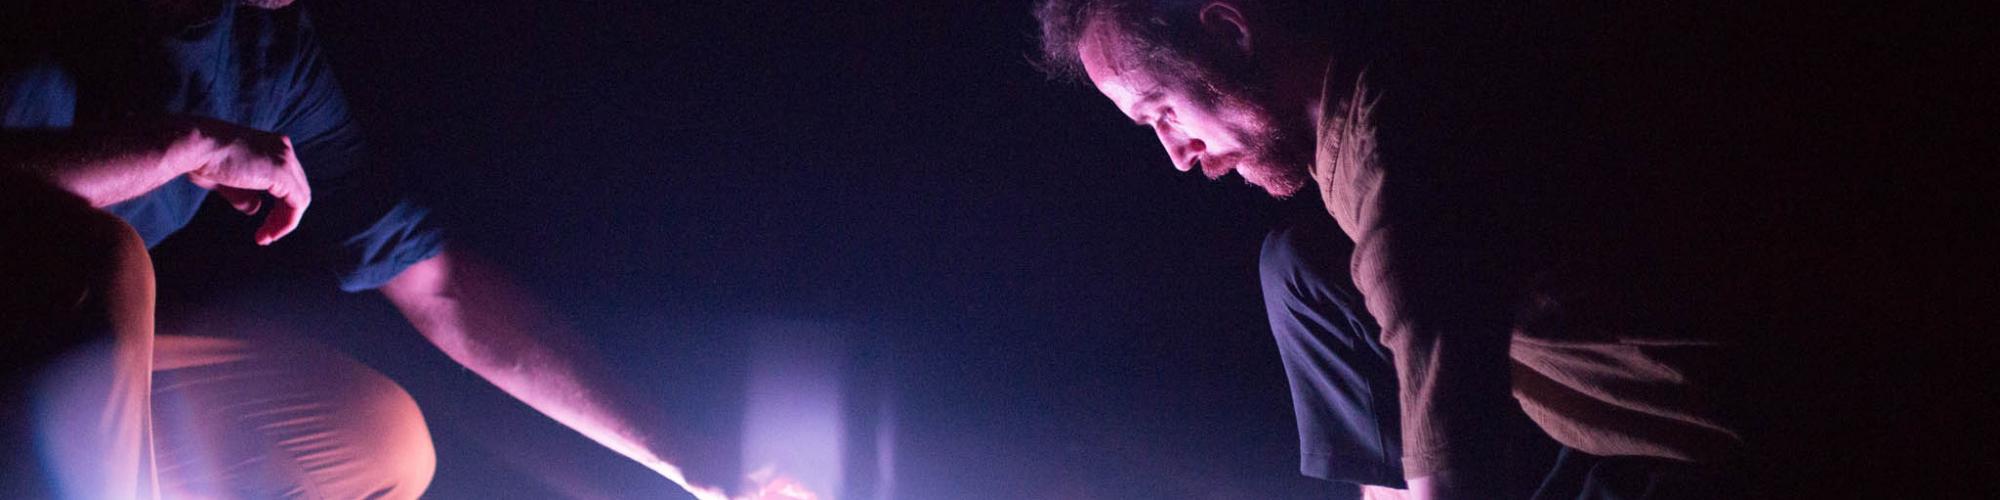 Crédit : Vanessa Fortin. Gigue in the dark 2.0 de Lük Fleury, Sandrine Martel-Laferrière, Ian Yaworski; avec Sébastien Chalumeau, Antoine Turmine